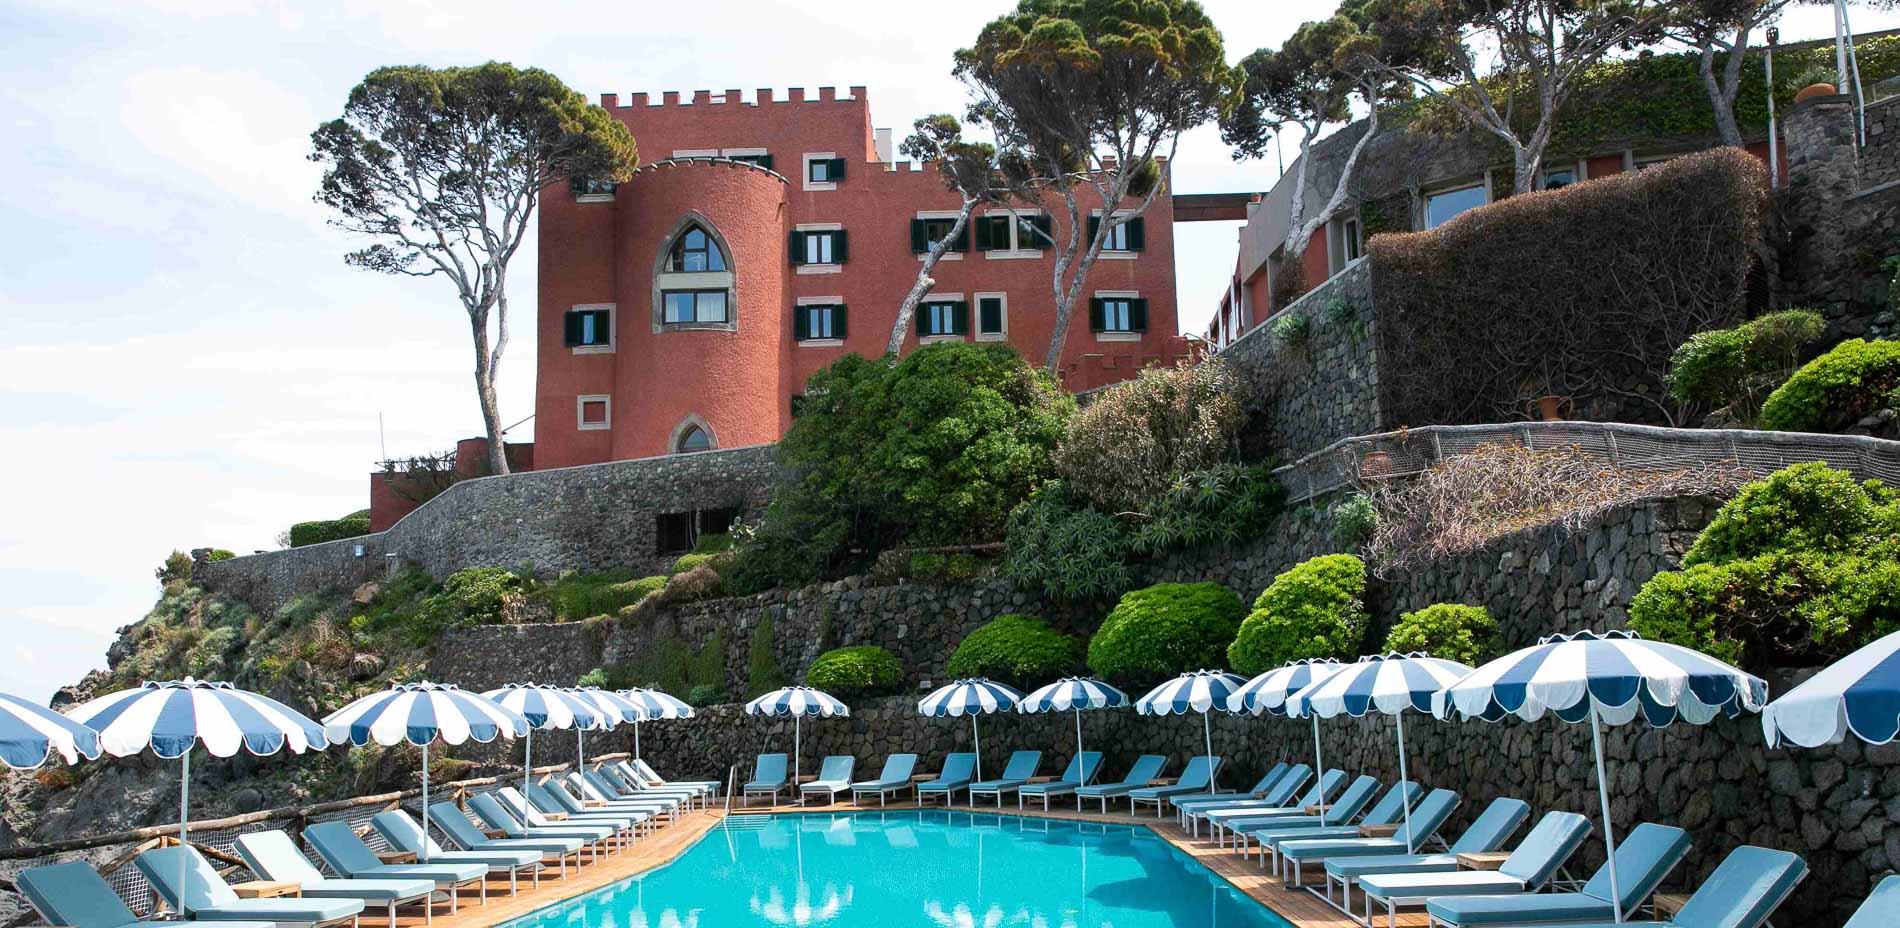 Mezzatorre Hotel Ischia